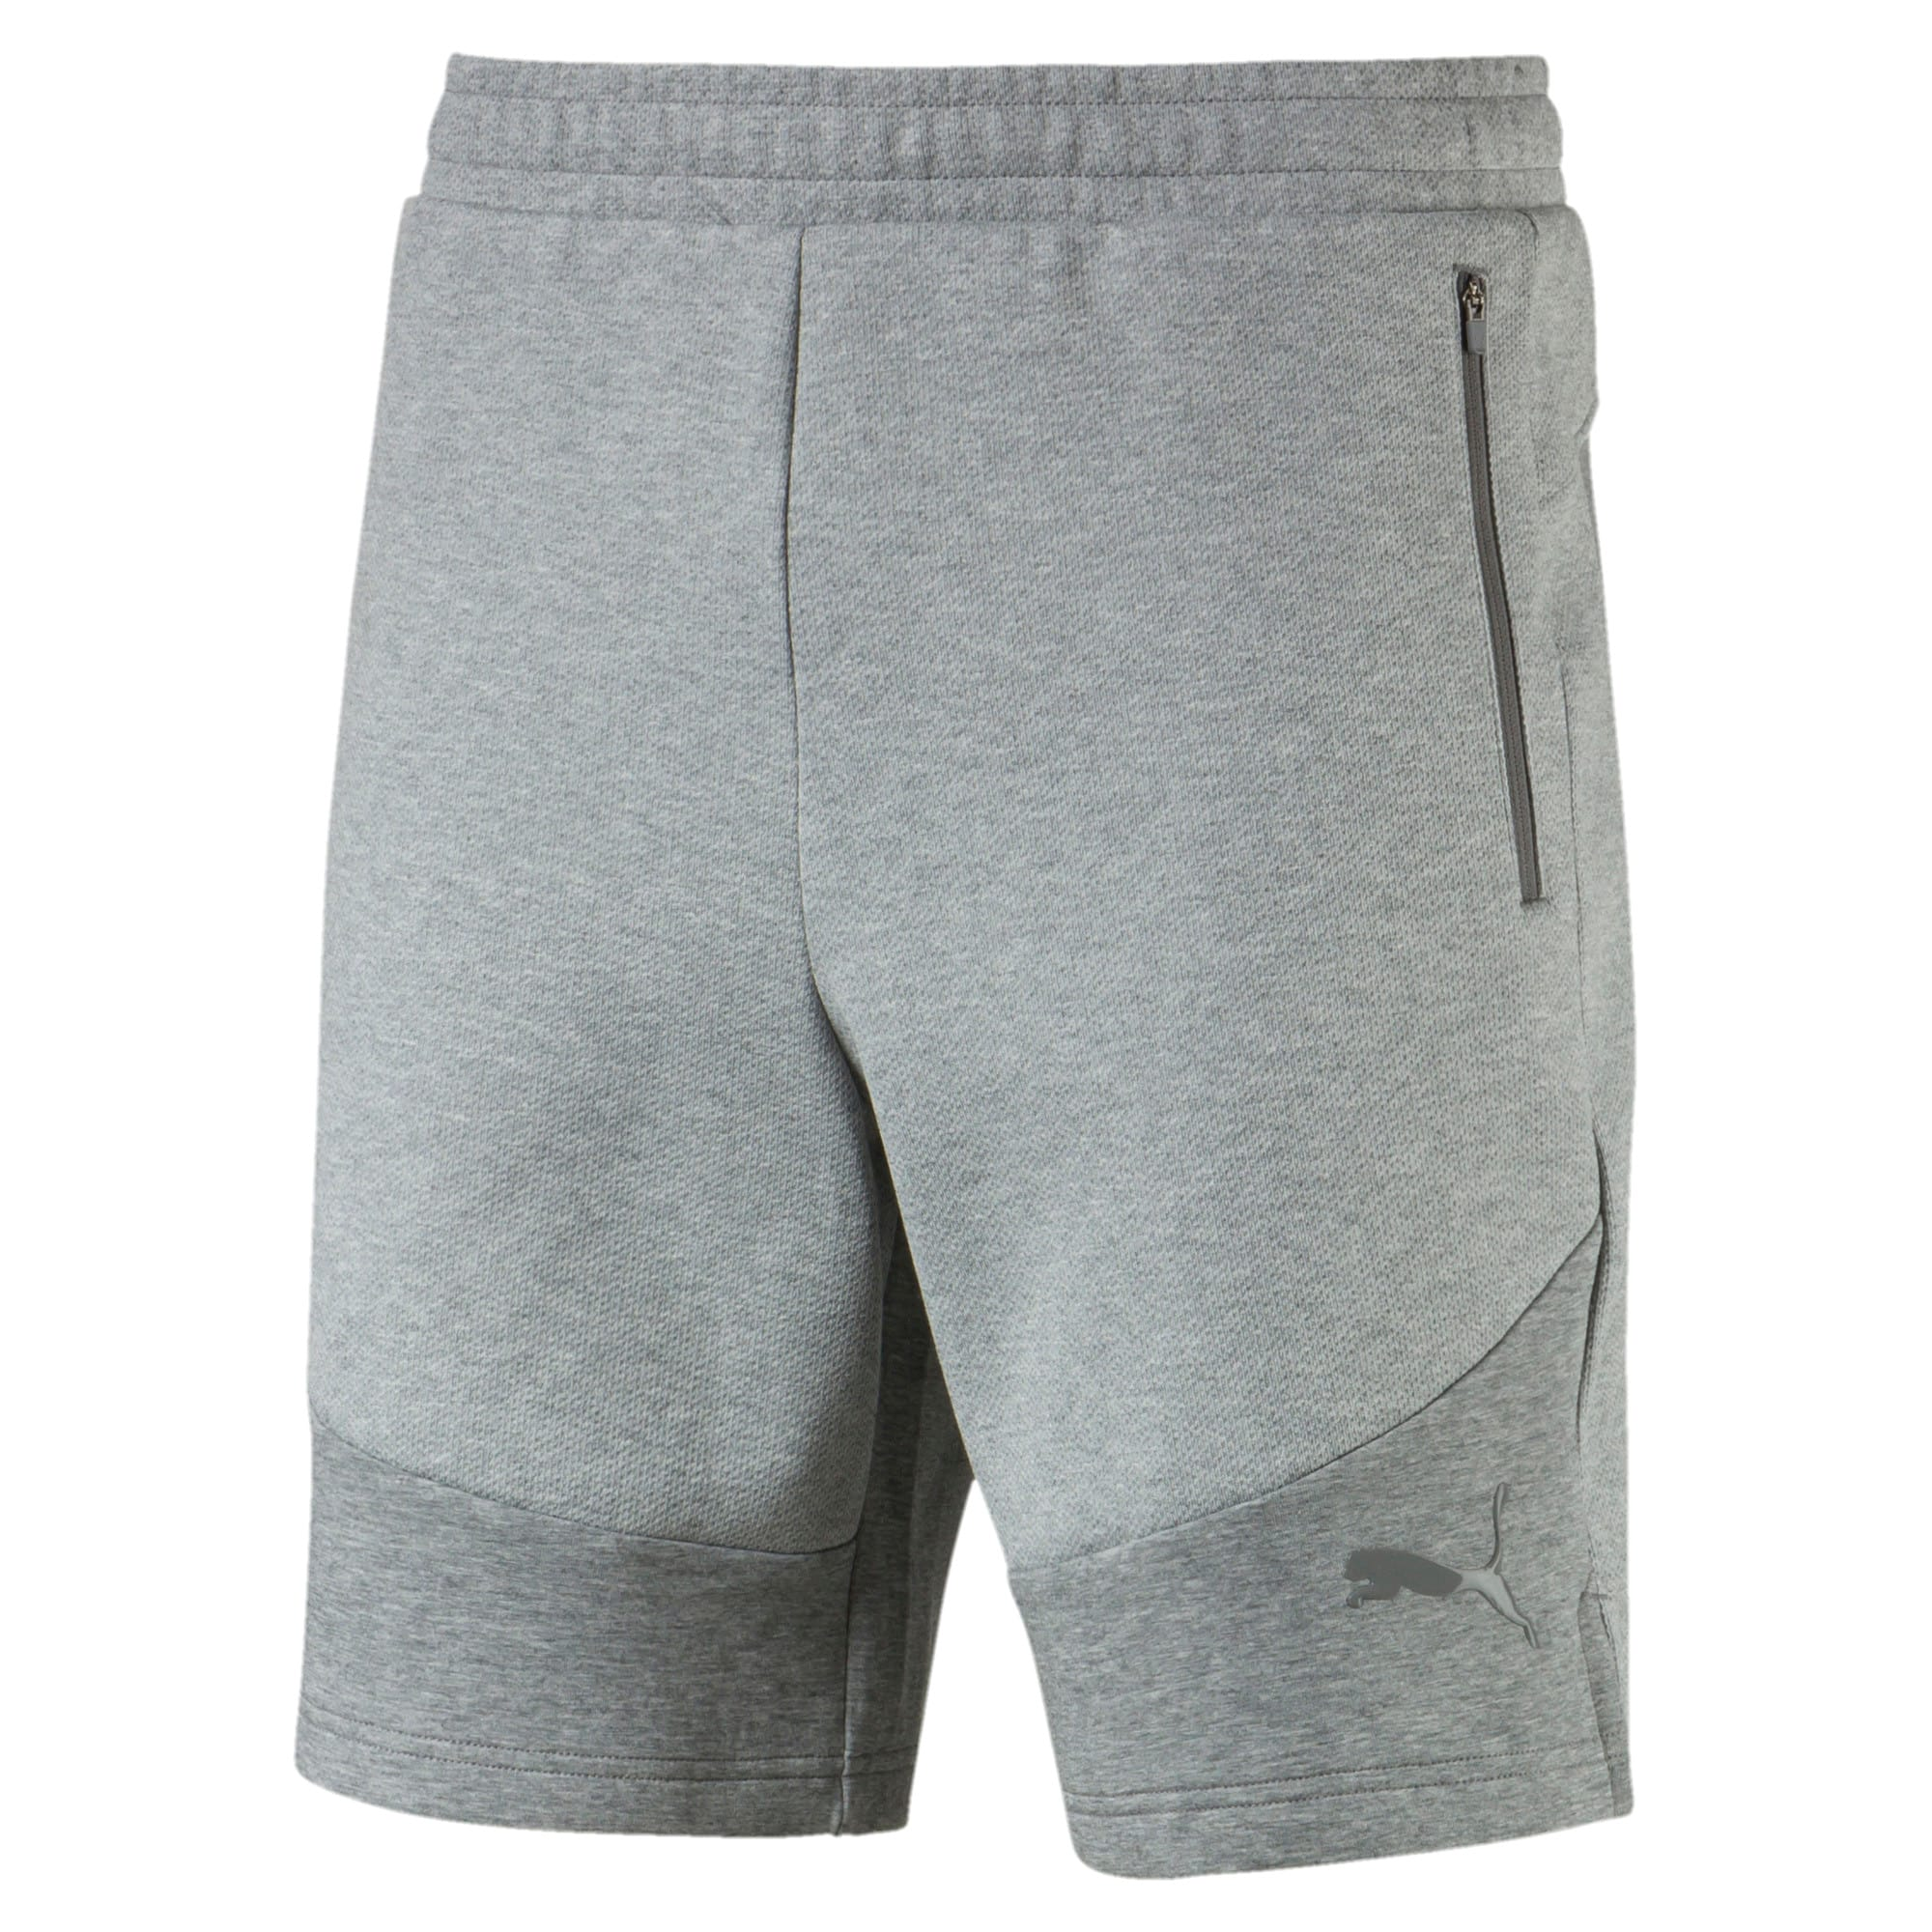 "Thumbnail 4 of Evostripe Move 8"" Men's Shorts, Medium Gray Heather, medium"